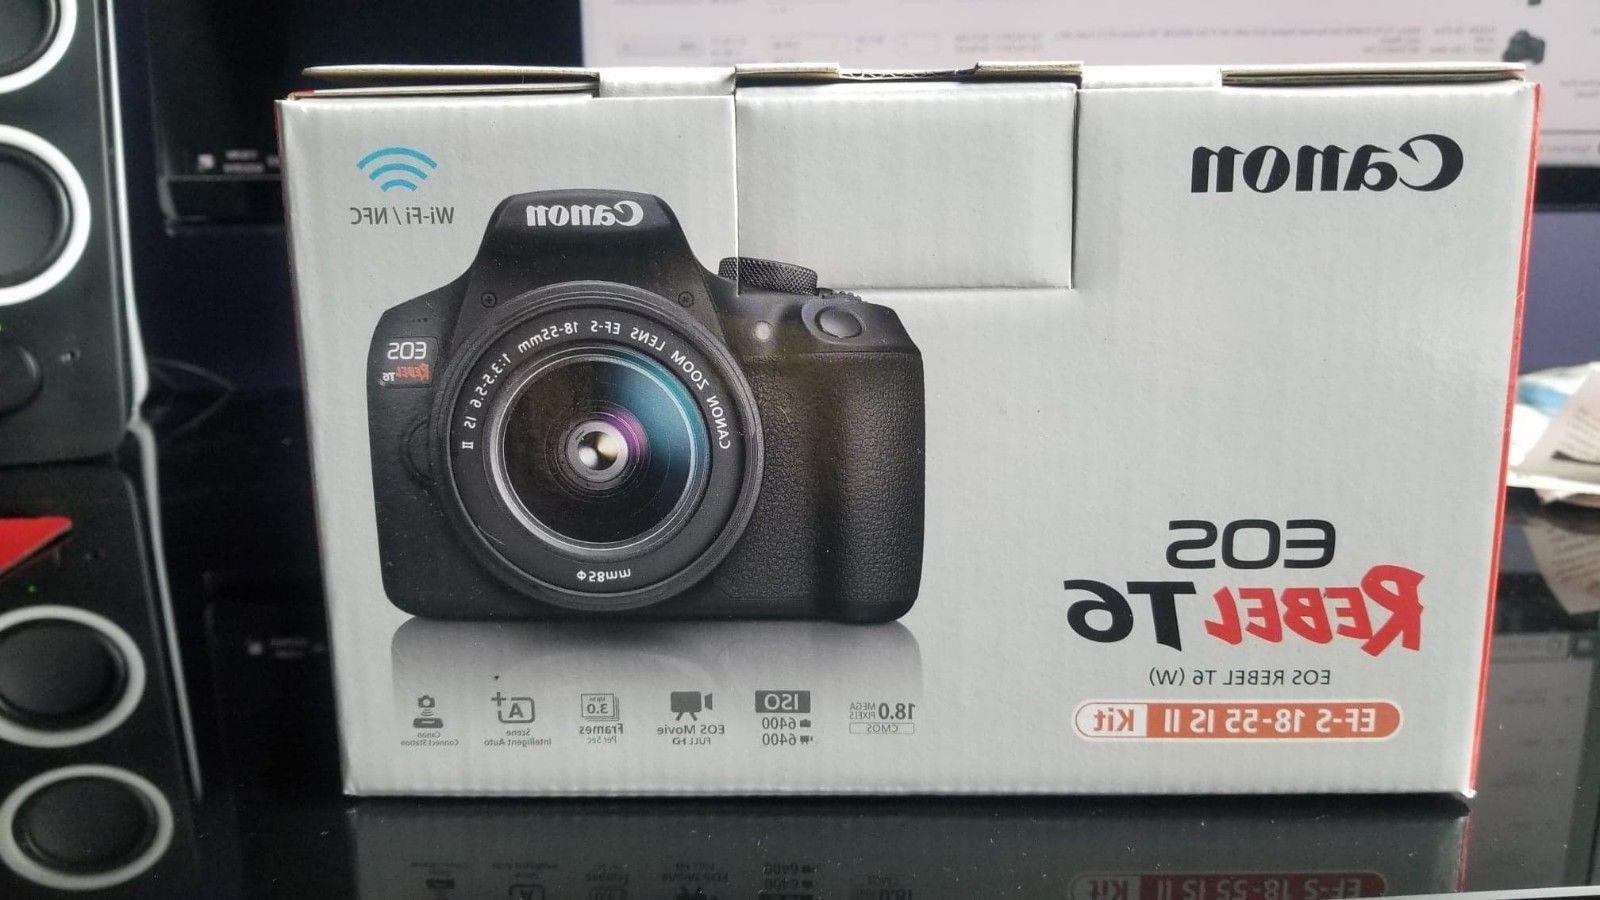 rebel t6 dslr camera kit 18mp w